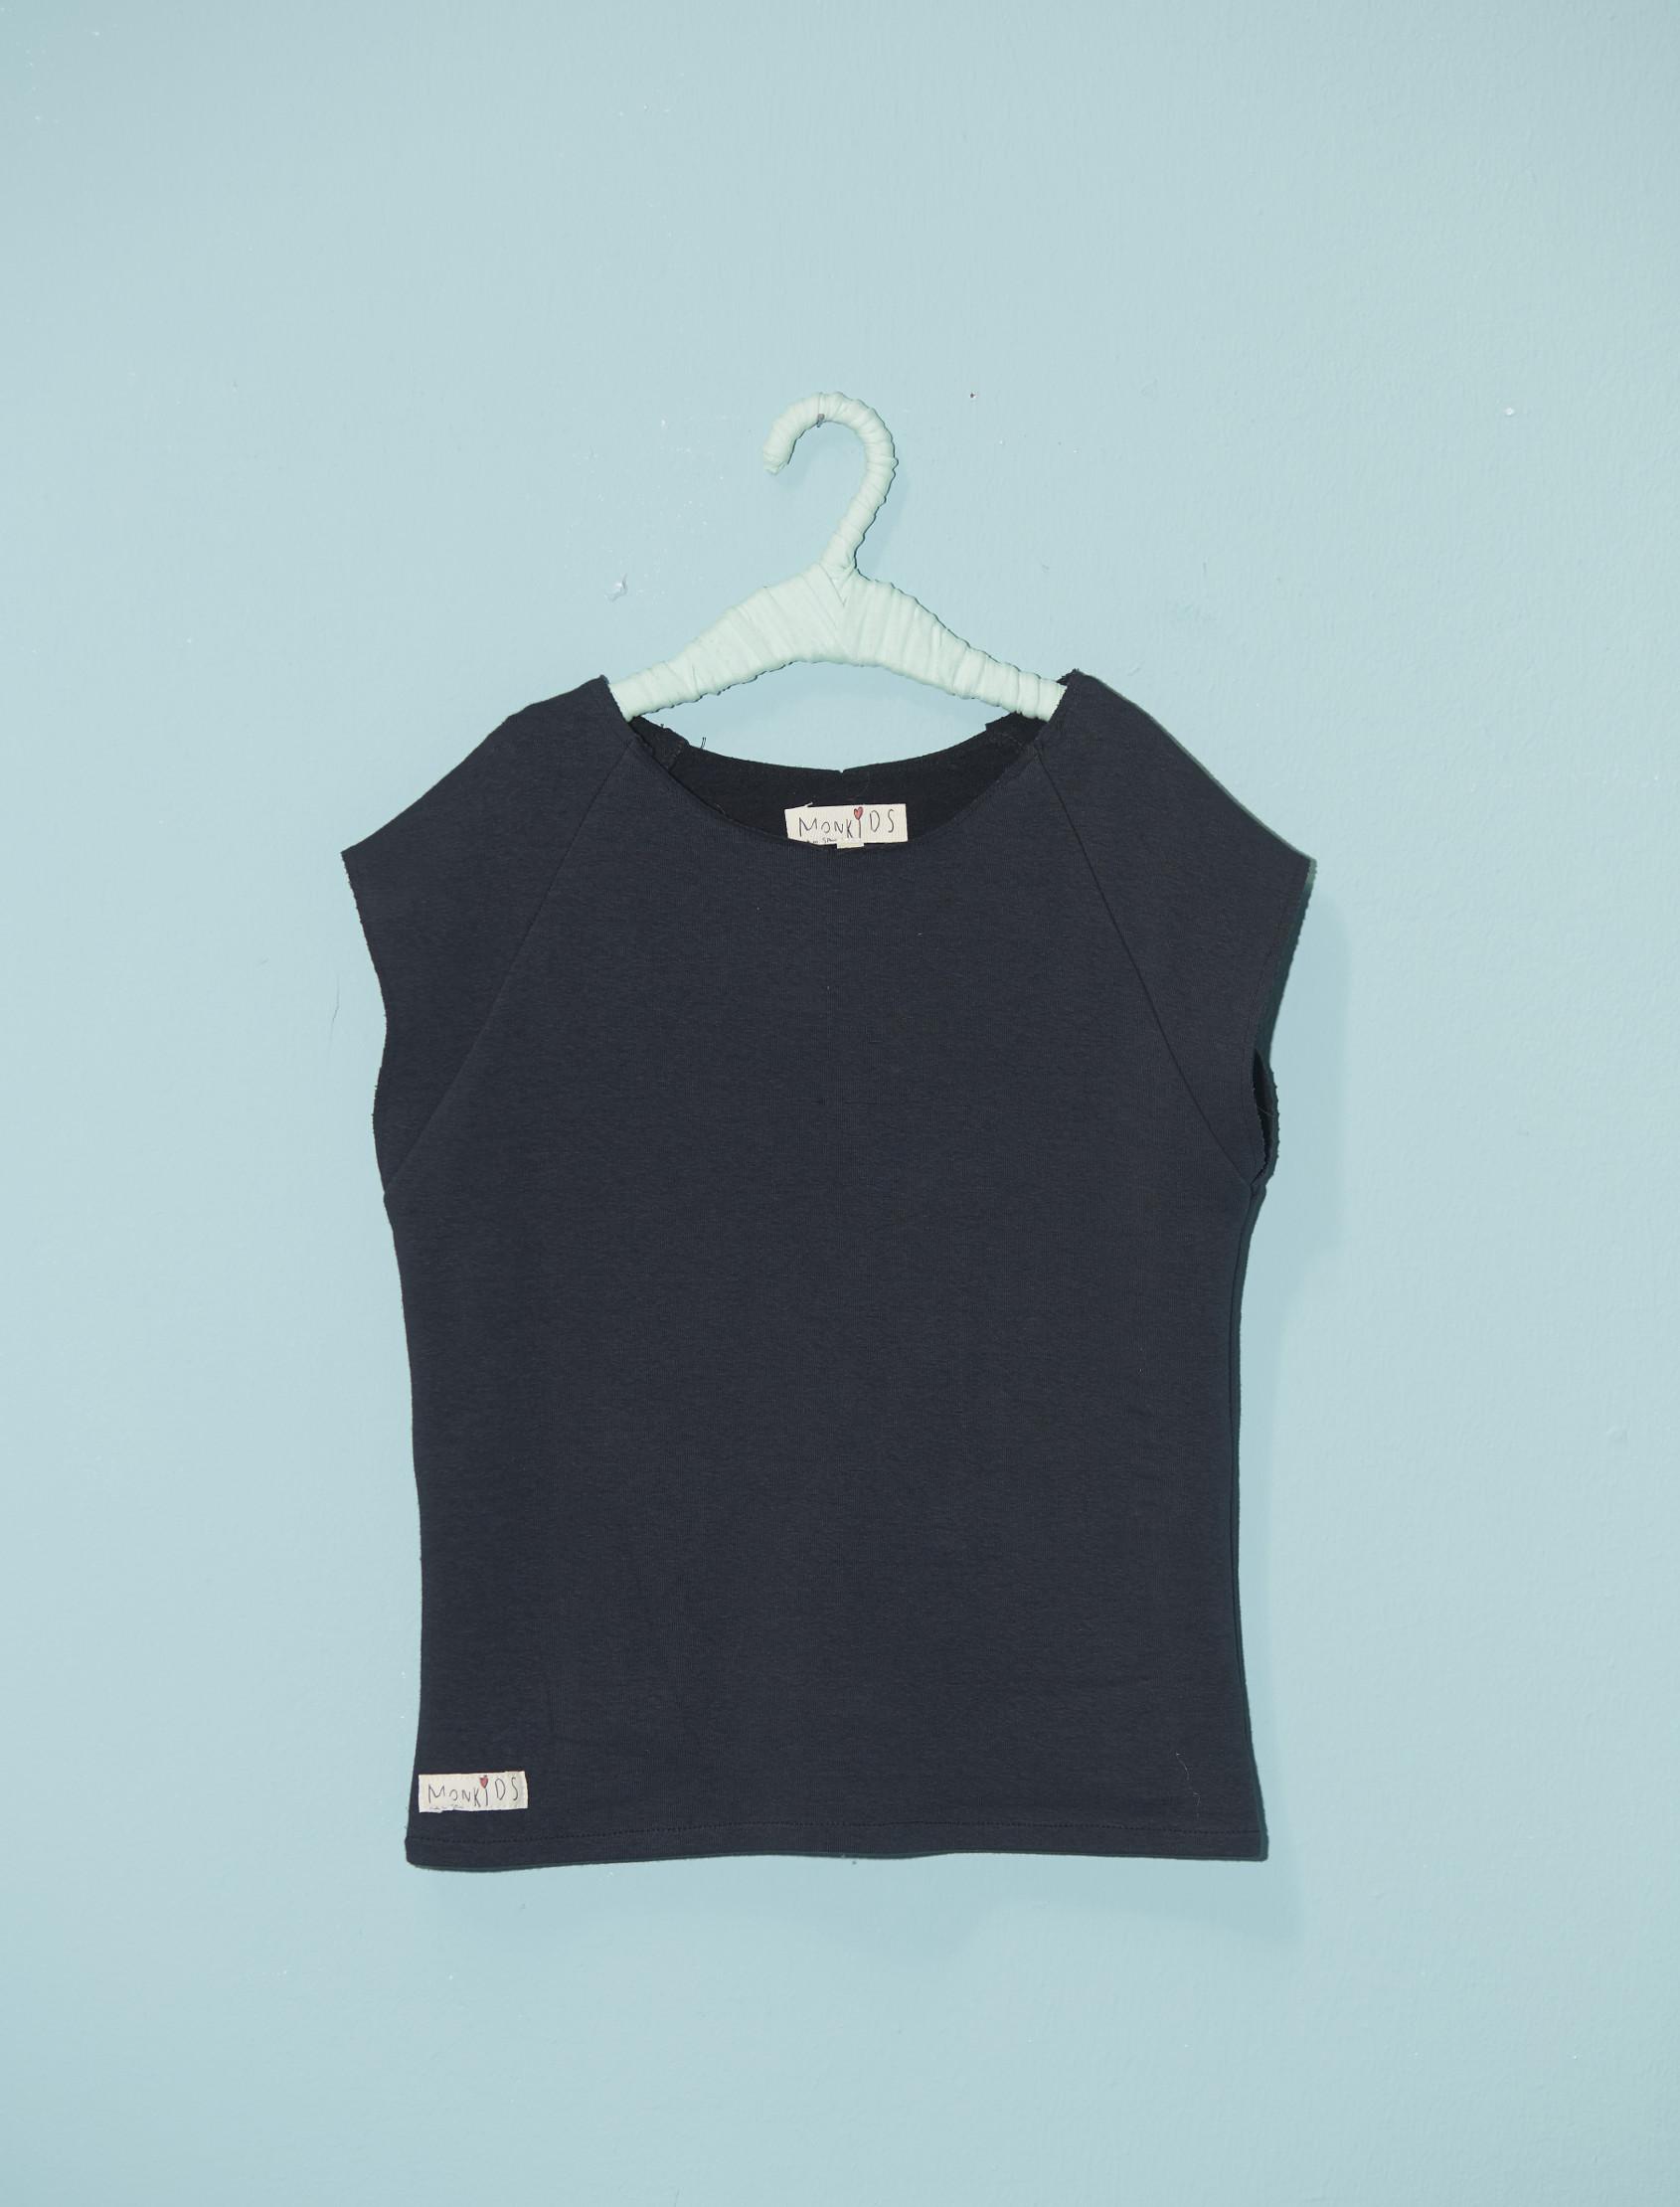 CamisetaMYMONBLACK_01